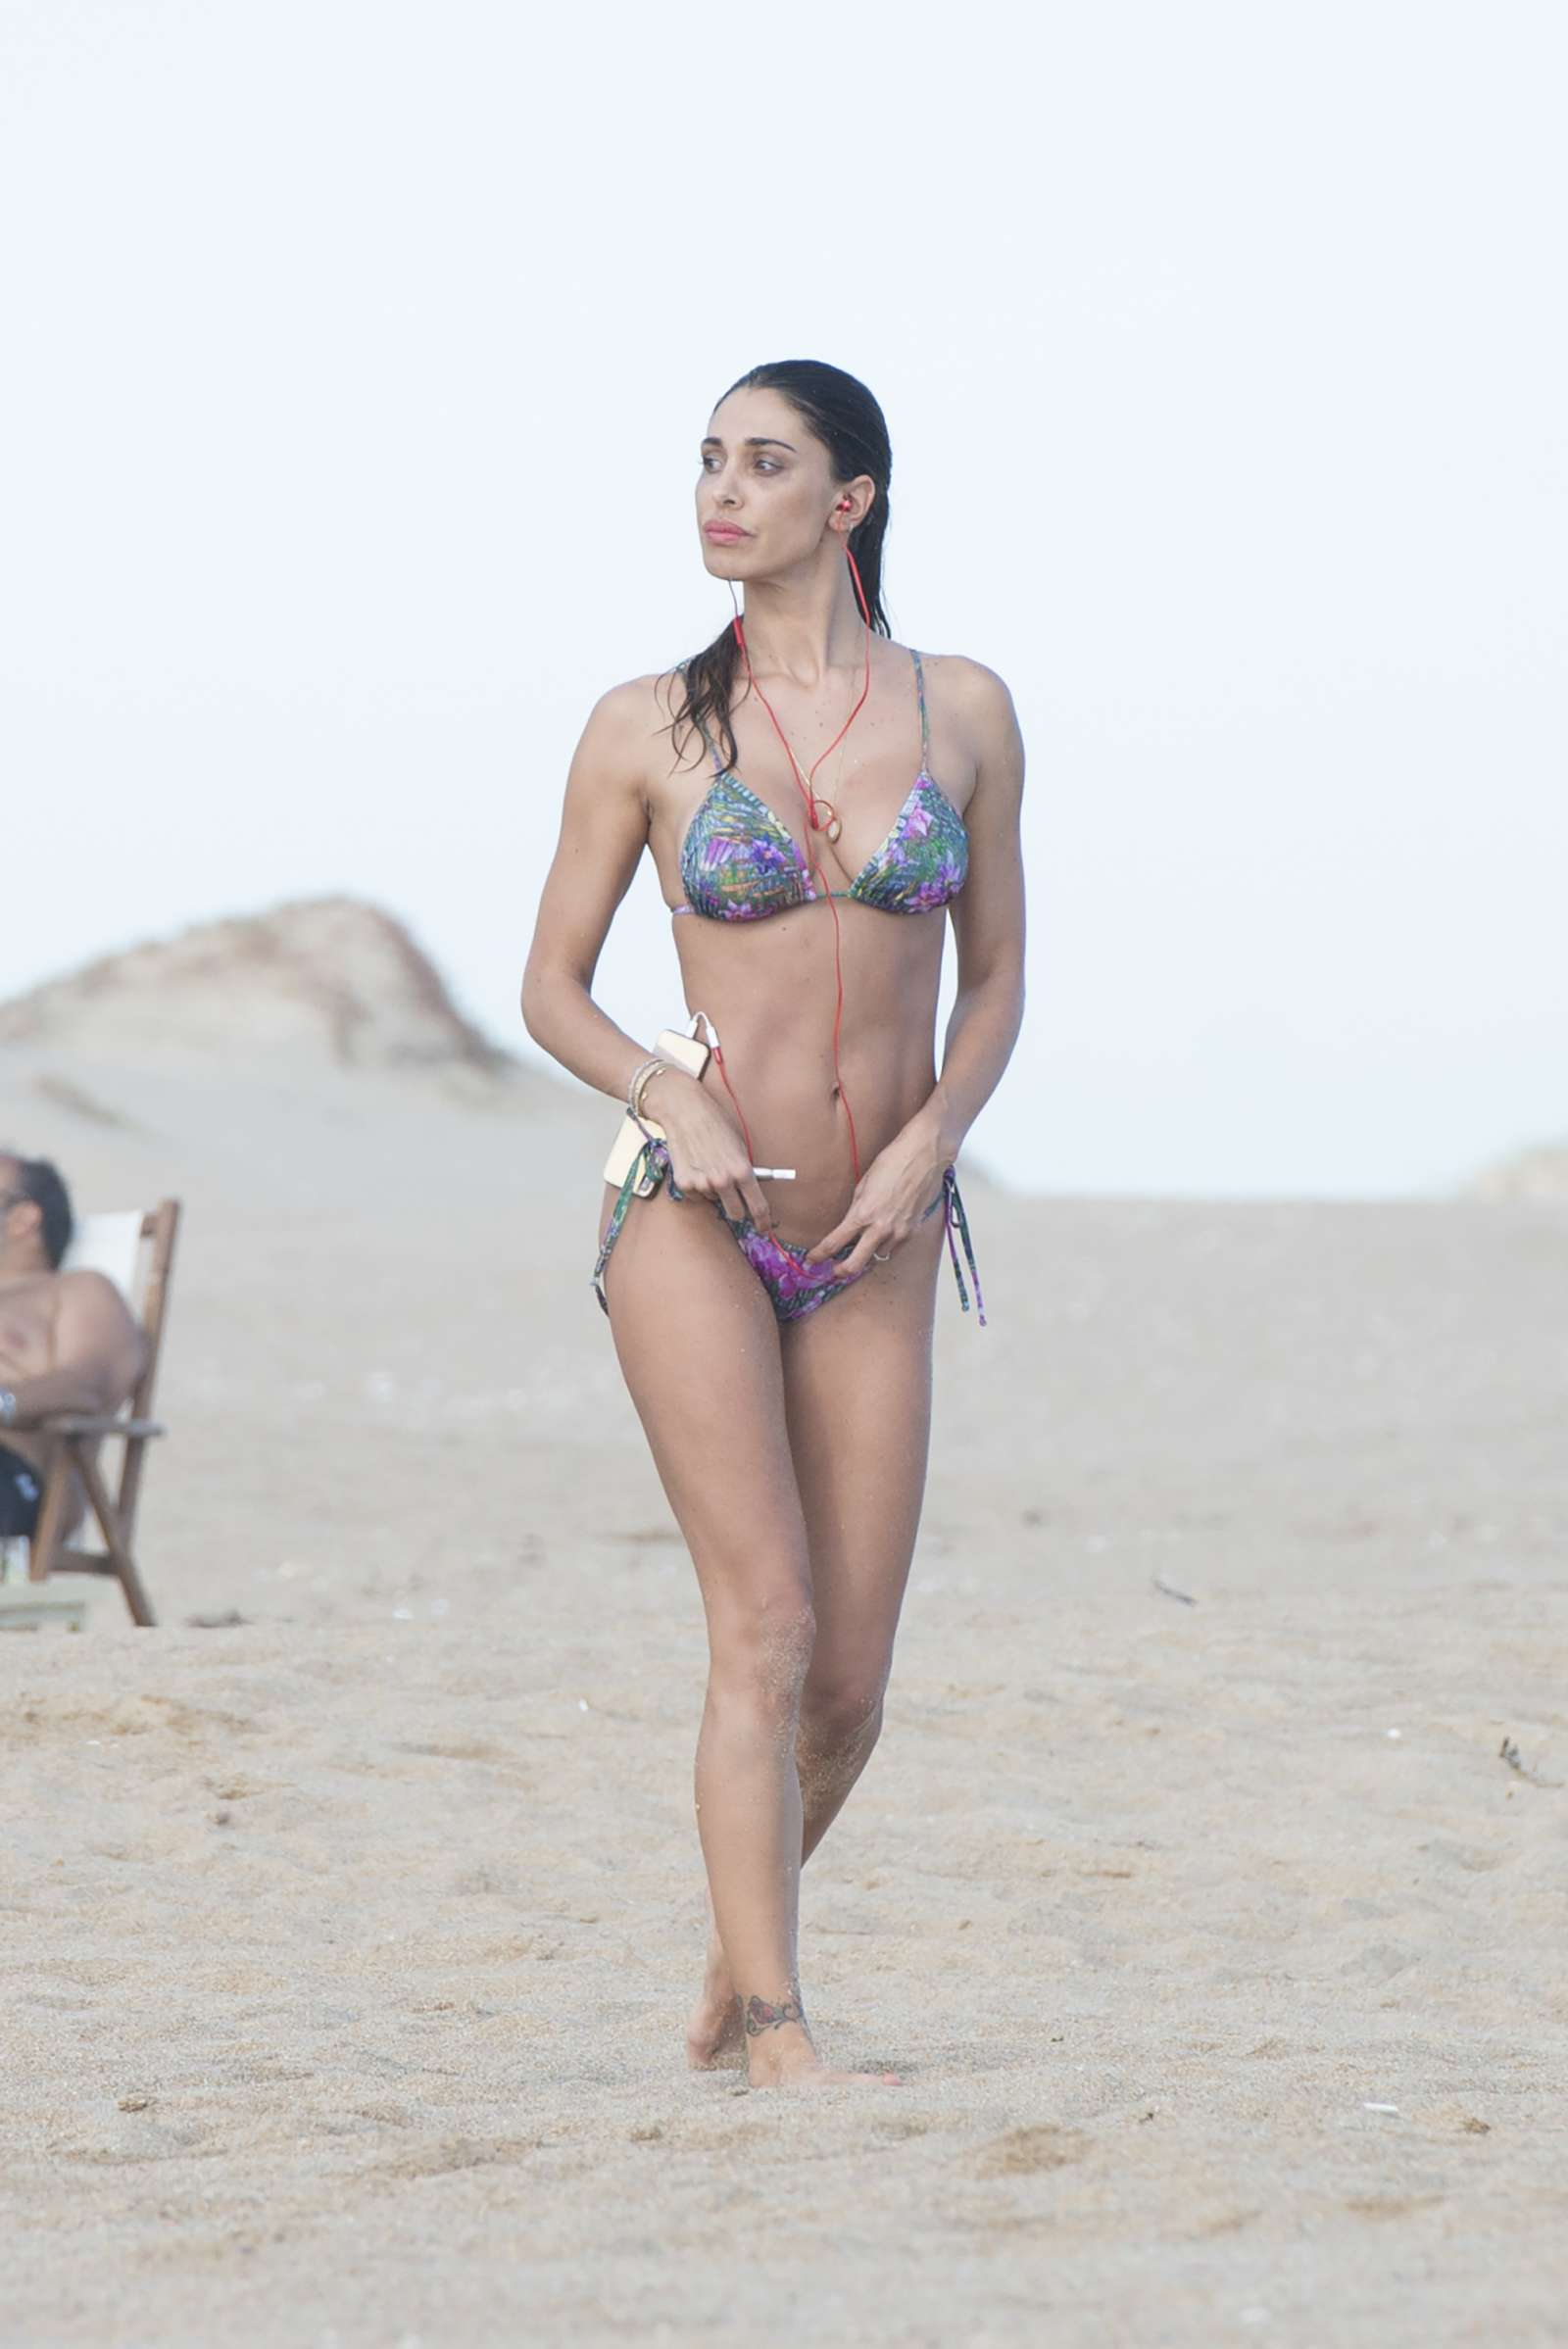 Belen Rodriguez in Bikini at the beach of Jose Ignacio in Uruguay